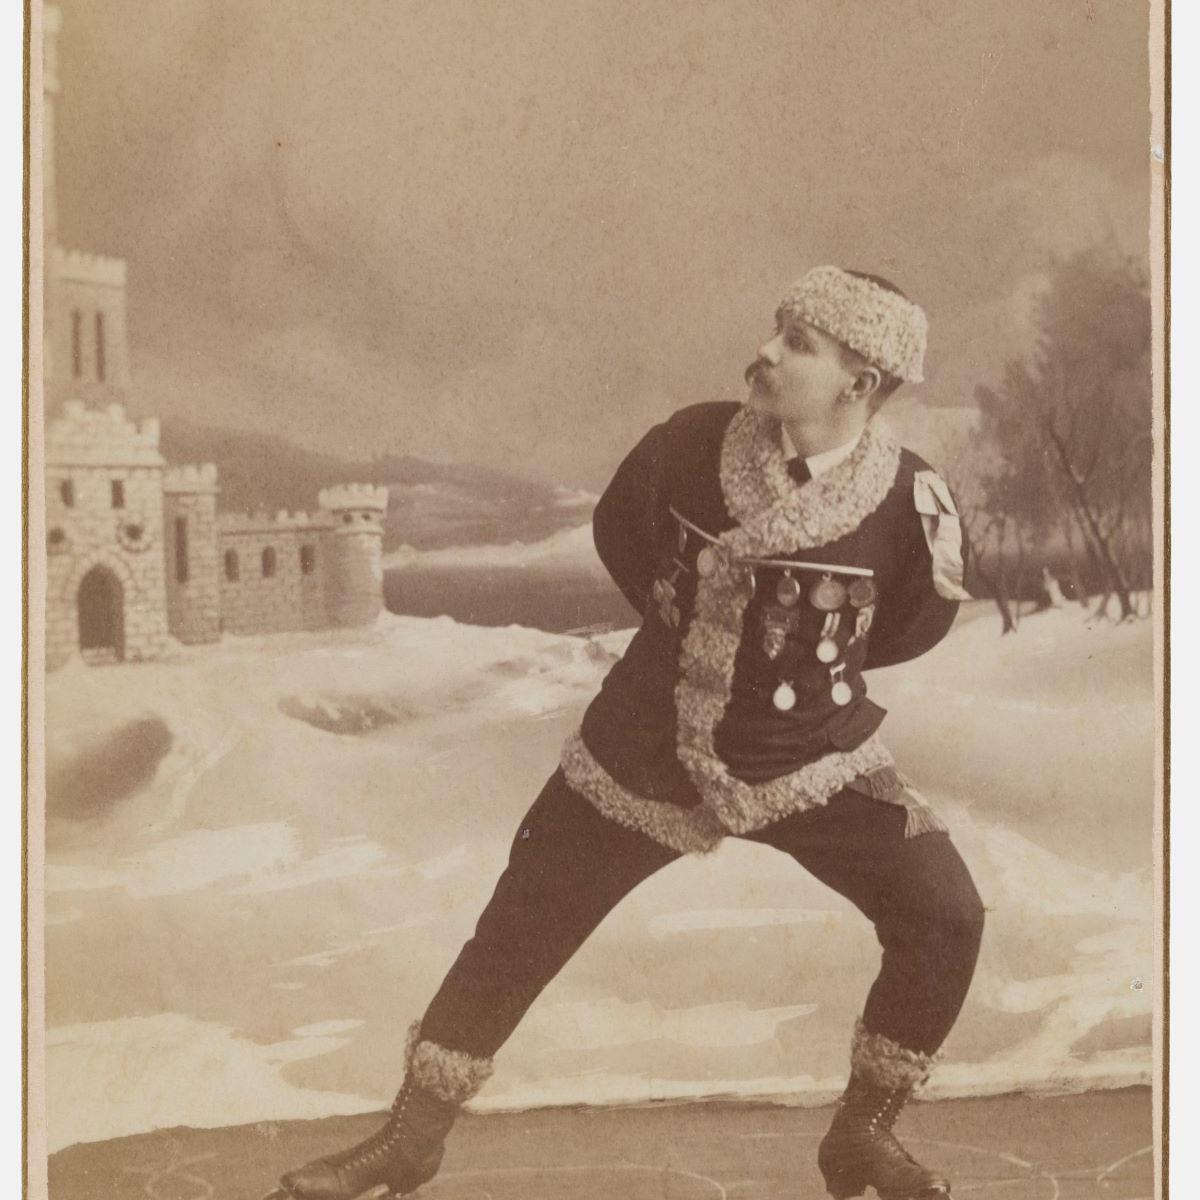 Alfred U. Palmquist and Peder T. Jurgens, St. Paul, MN, [Skater], 1880s